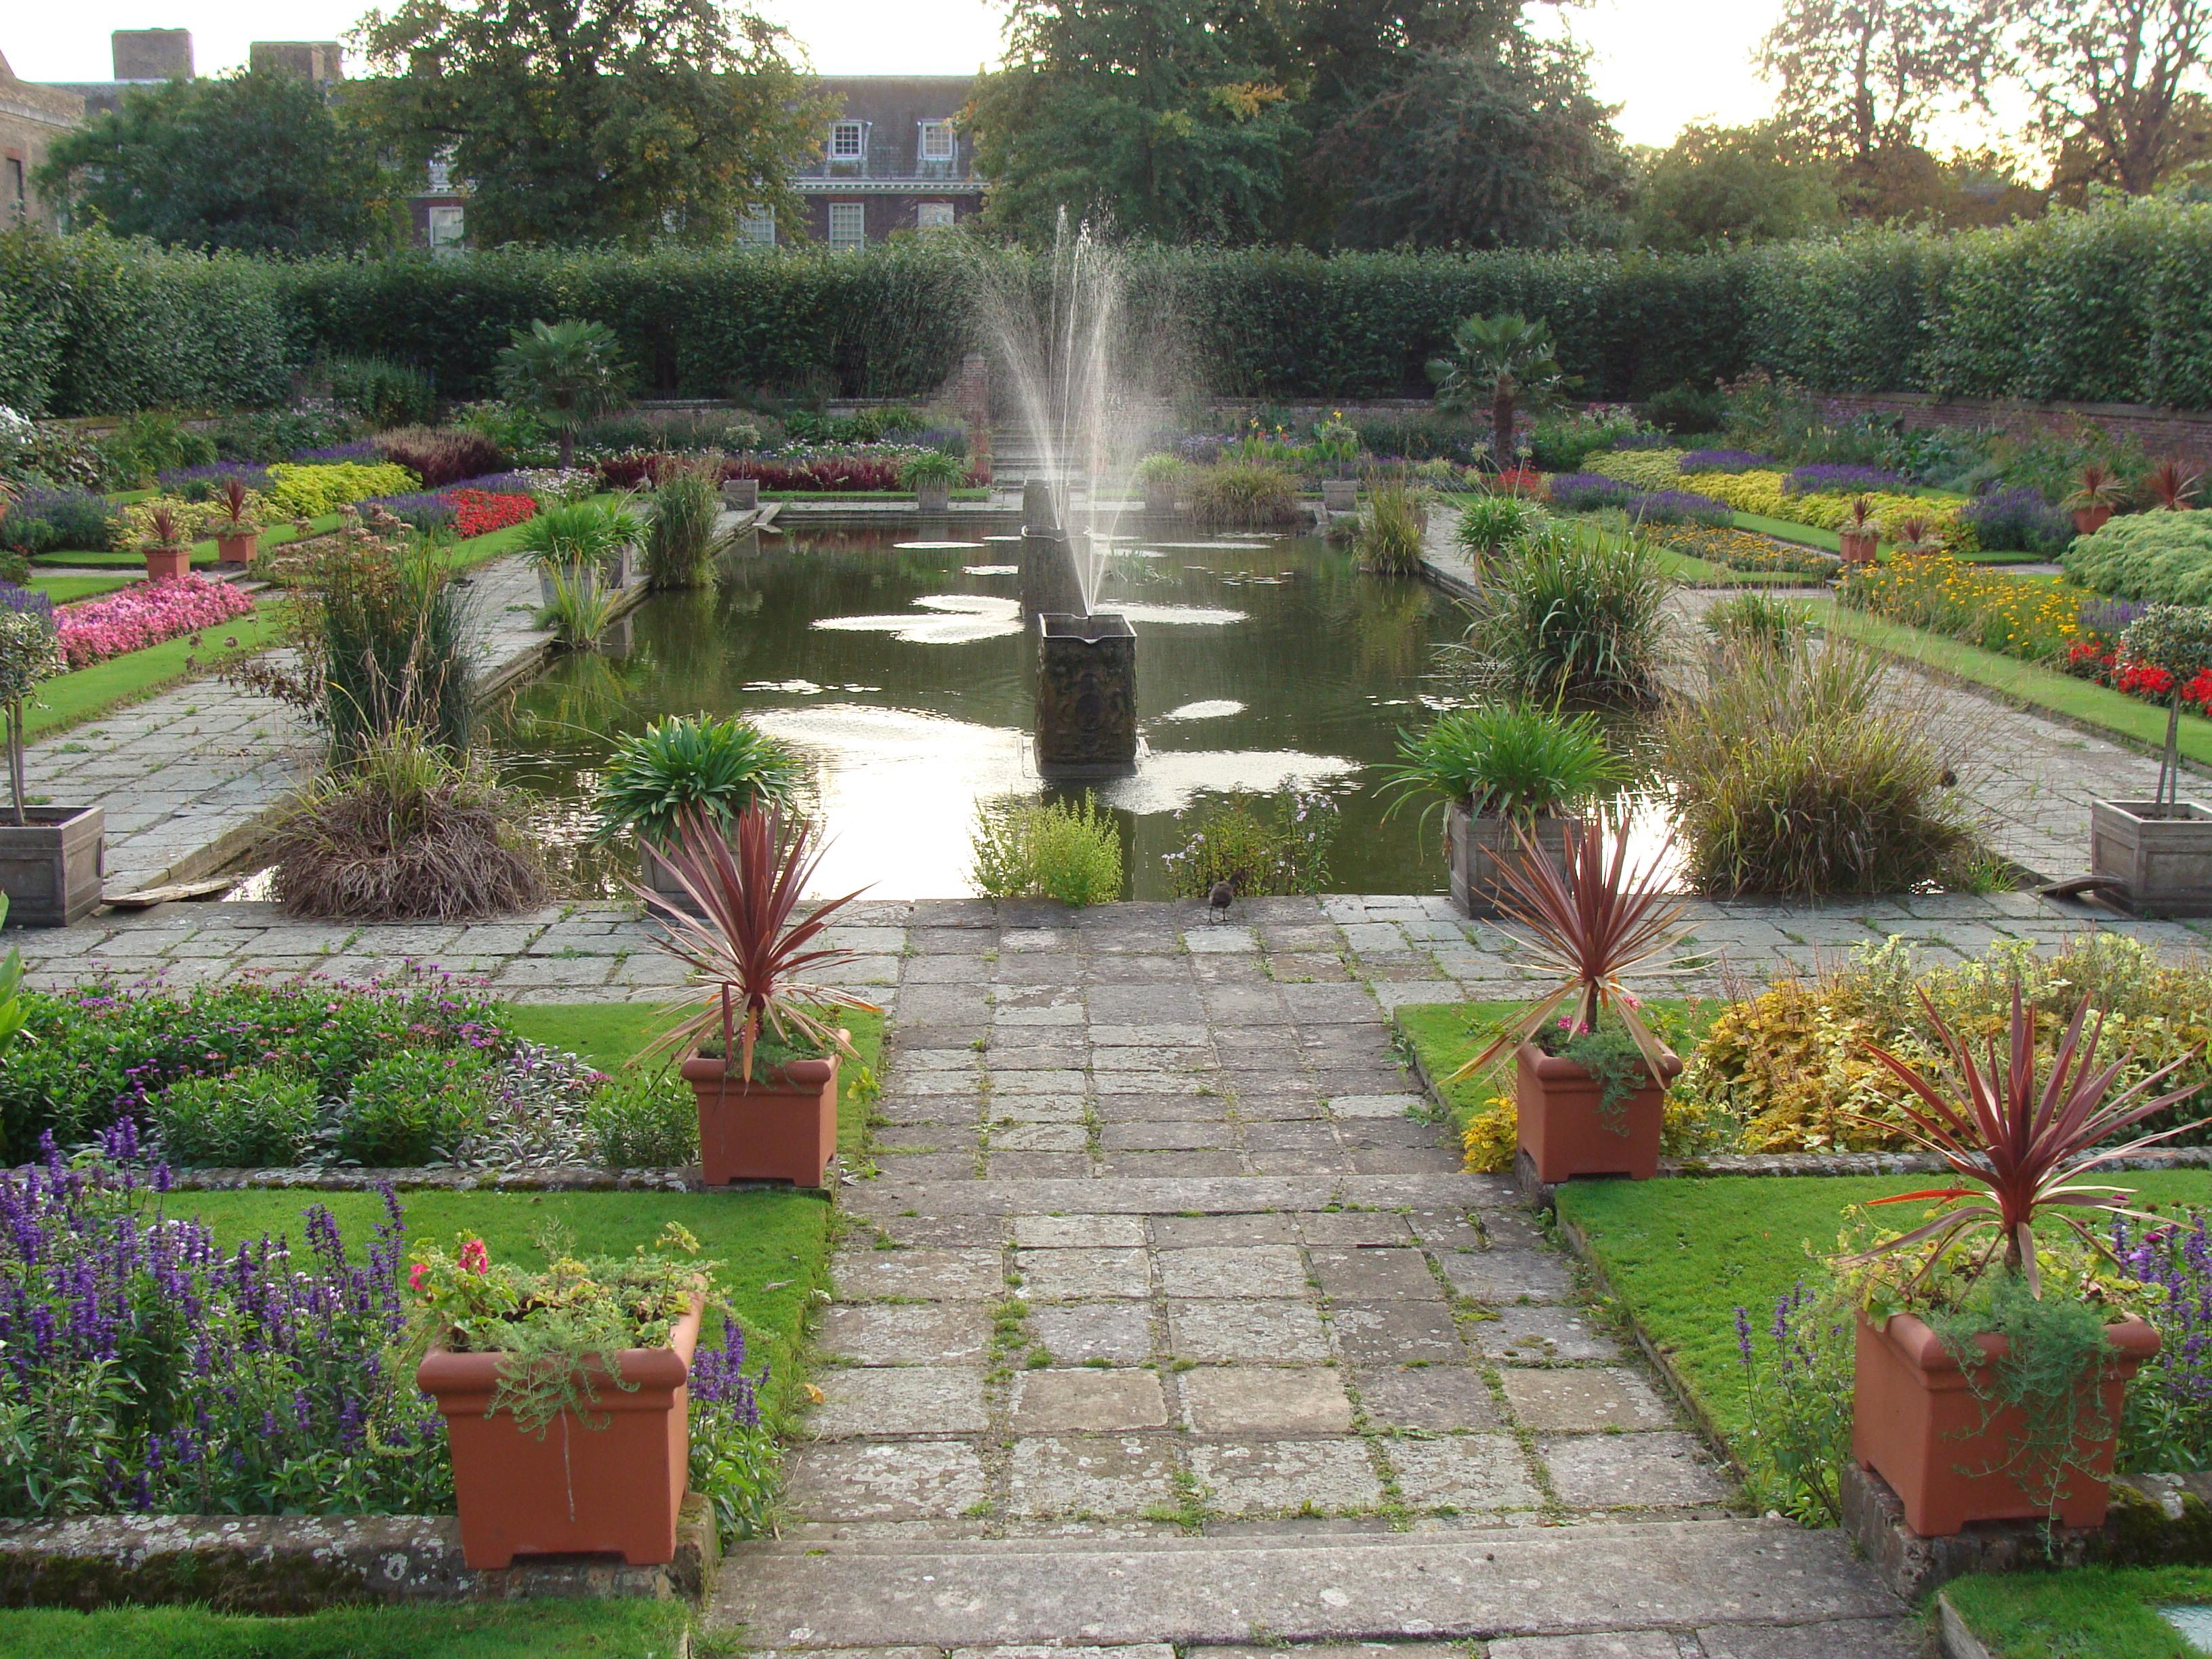 The_Sunken_Gardens